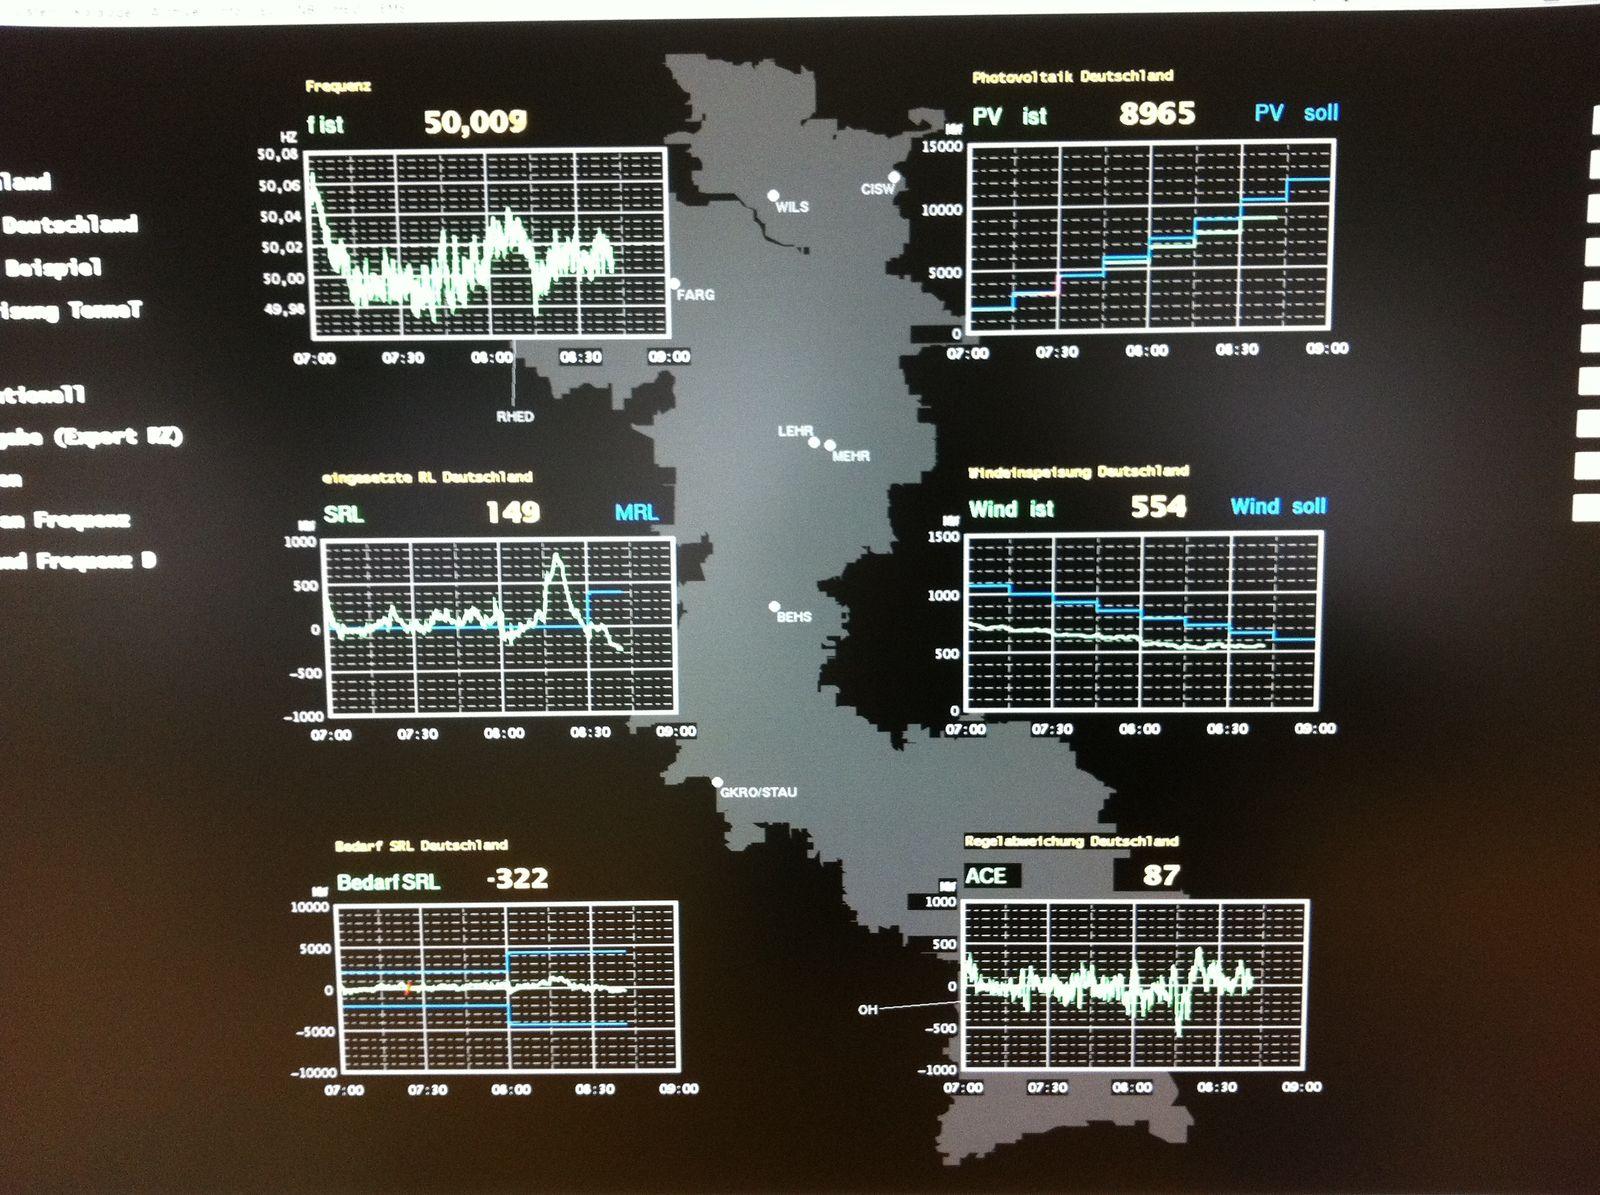 Tennet-Schaltleitung / Monitor 1